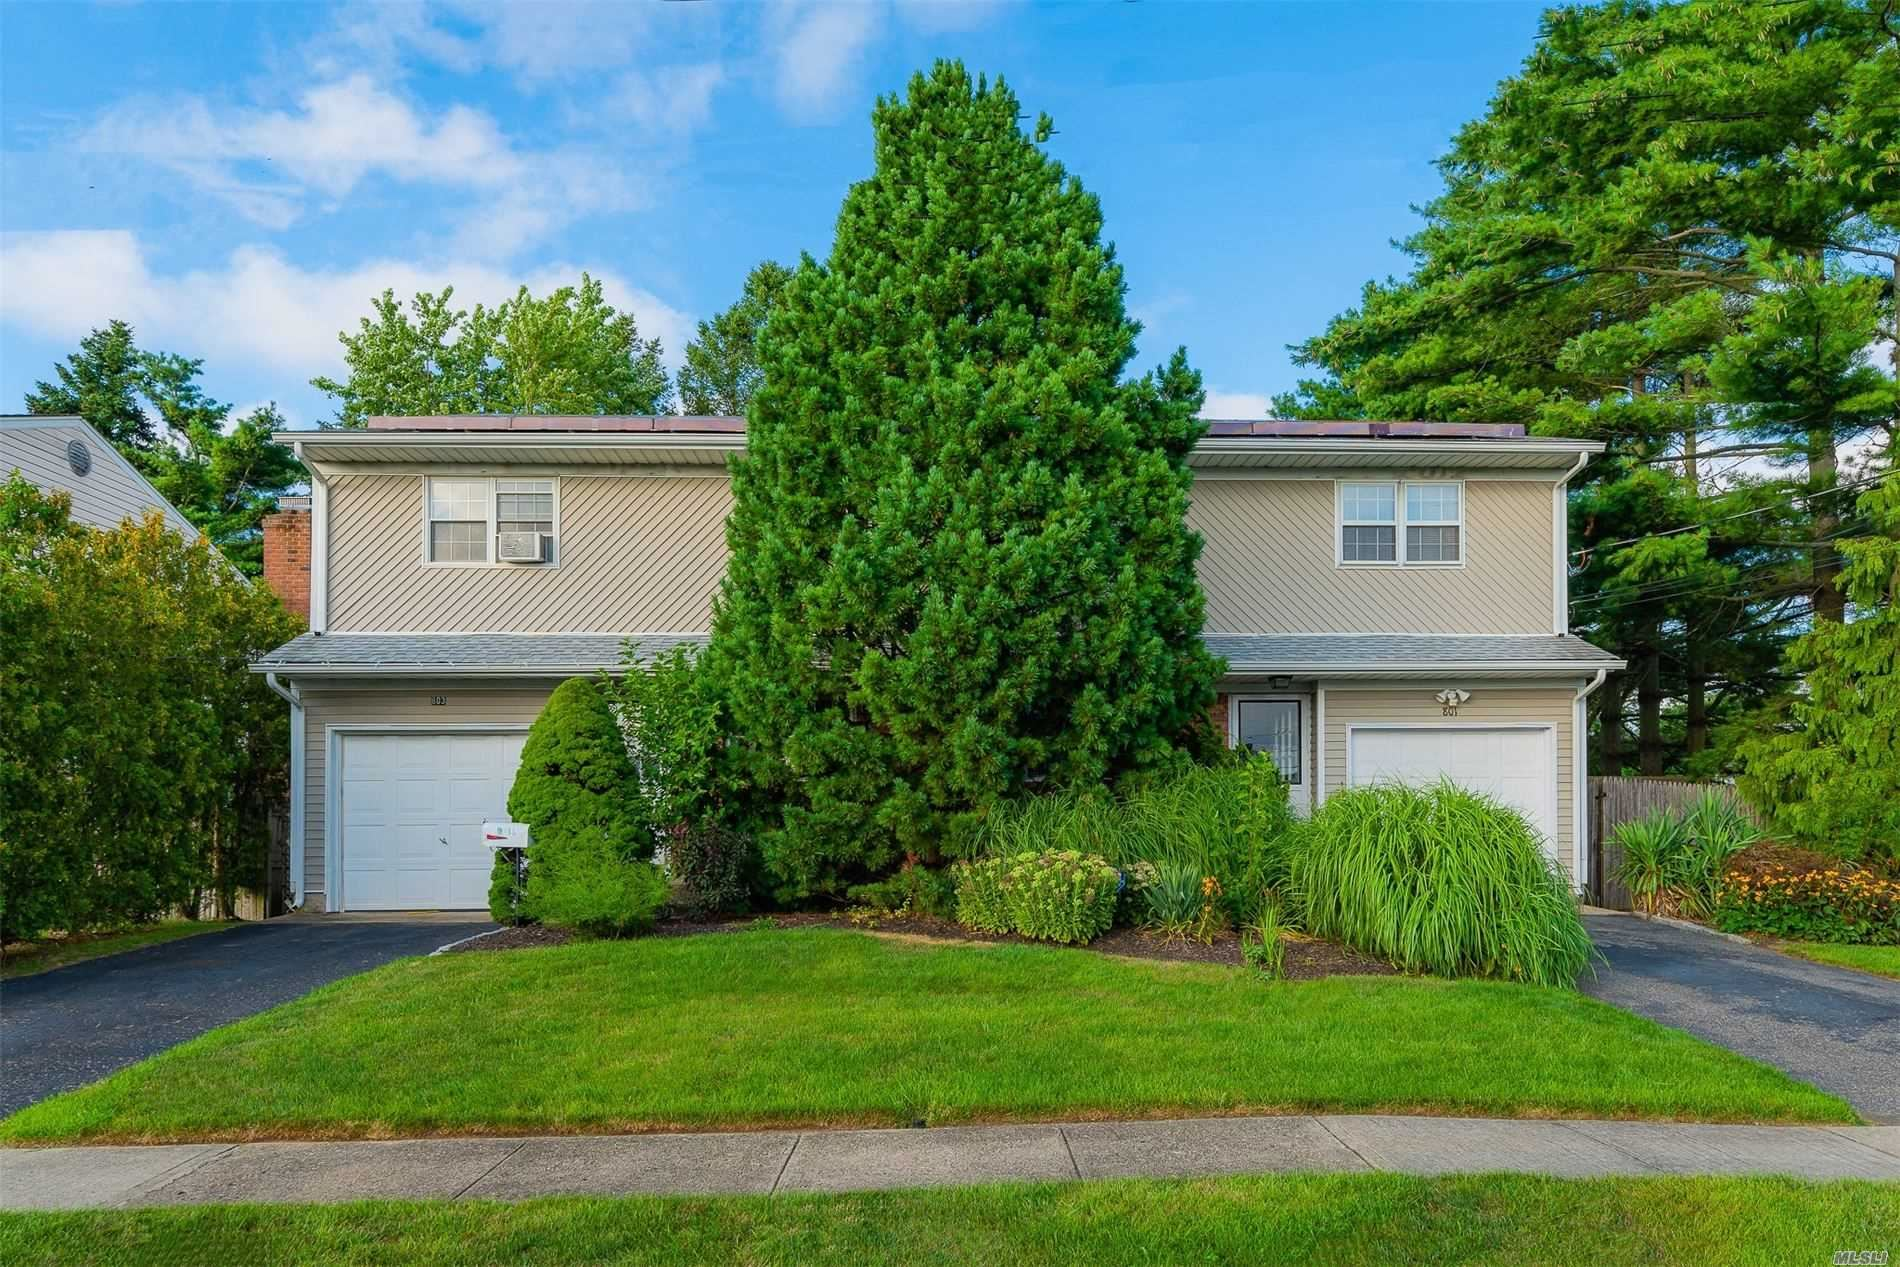 801-803 N Jefferson Avenue, Lindenhurst, NY 11757 - MLS#: 3238285